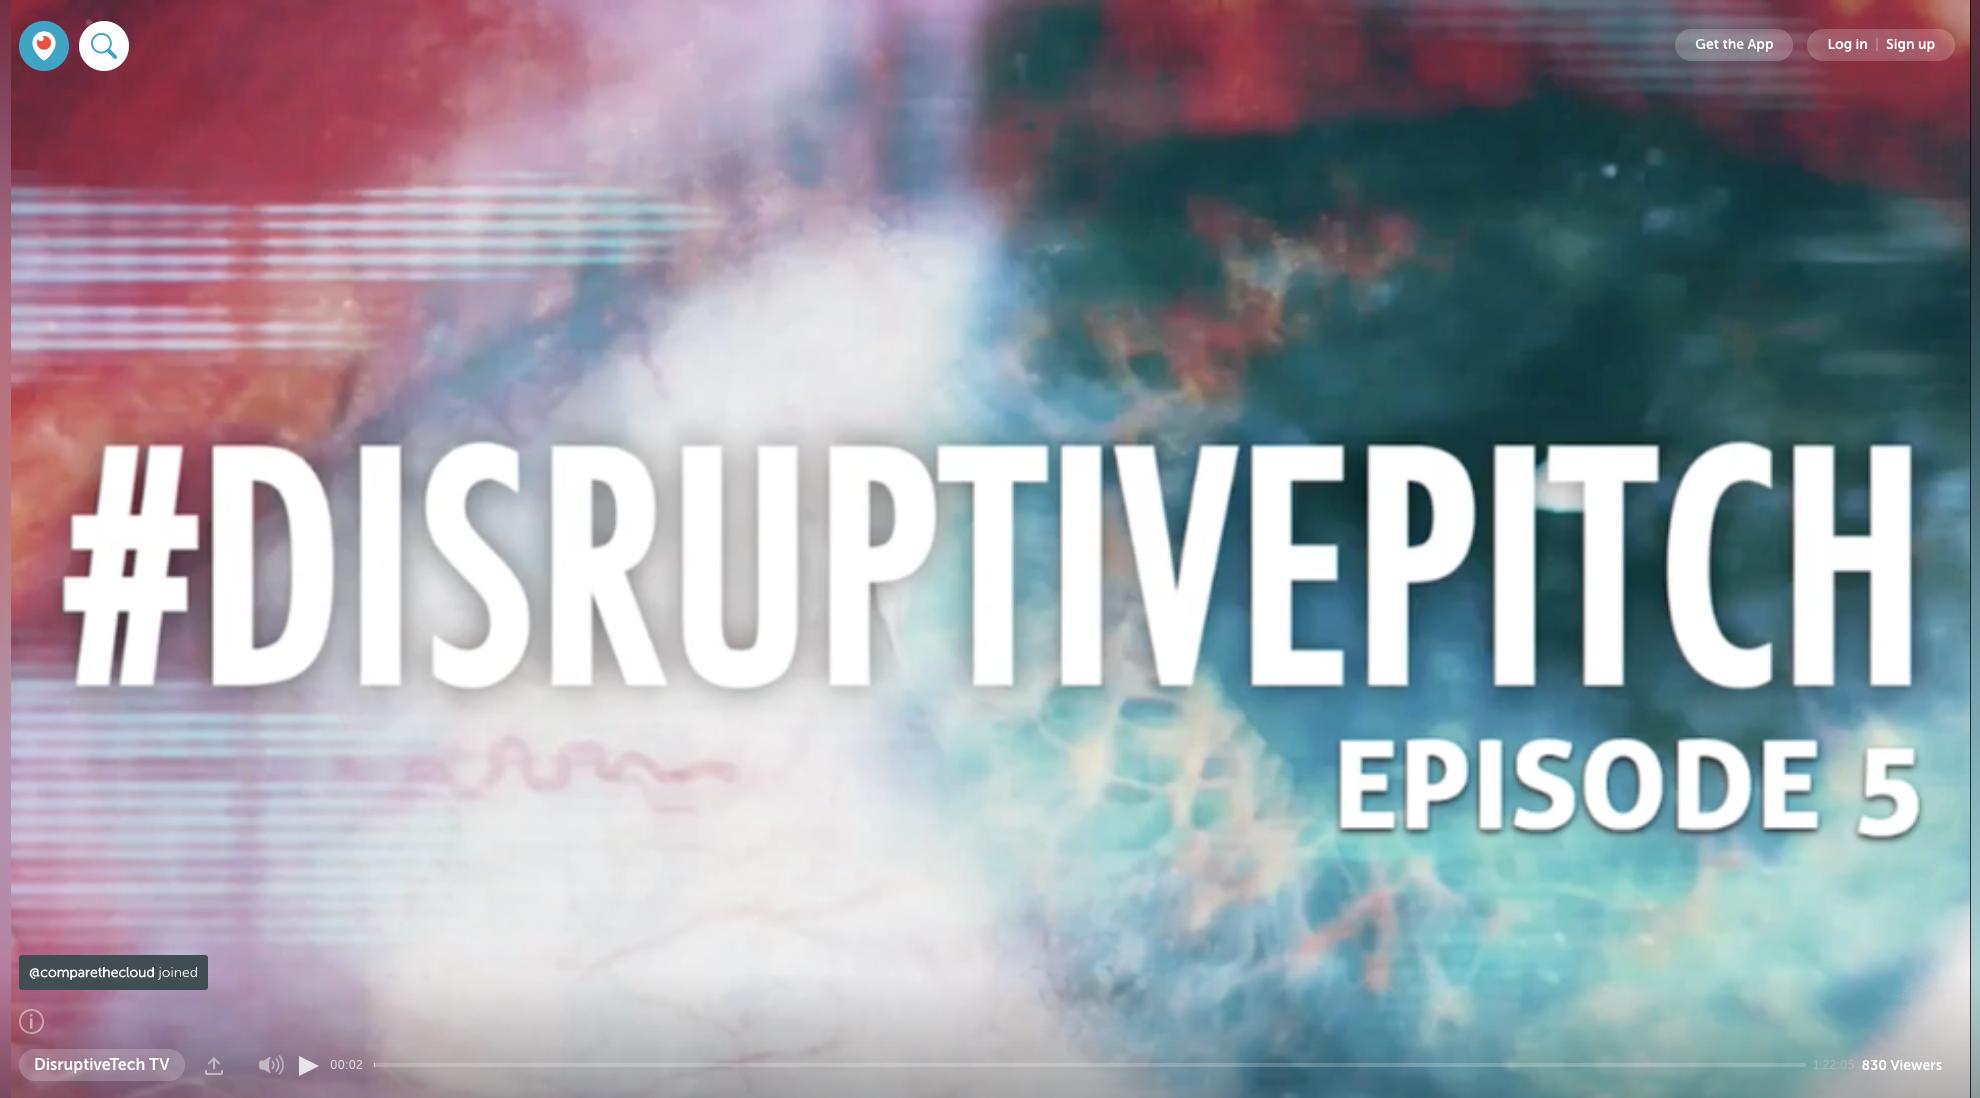 Disruptive Pitch